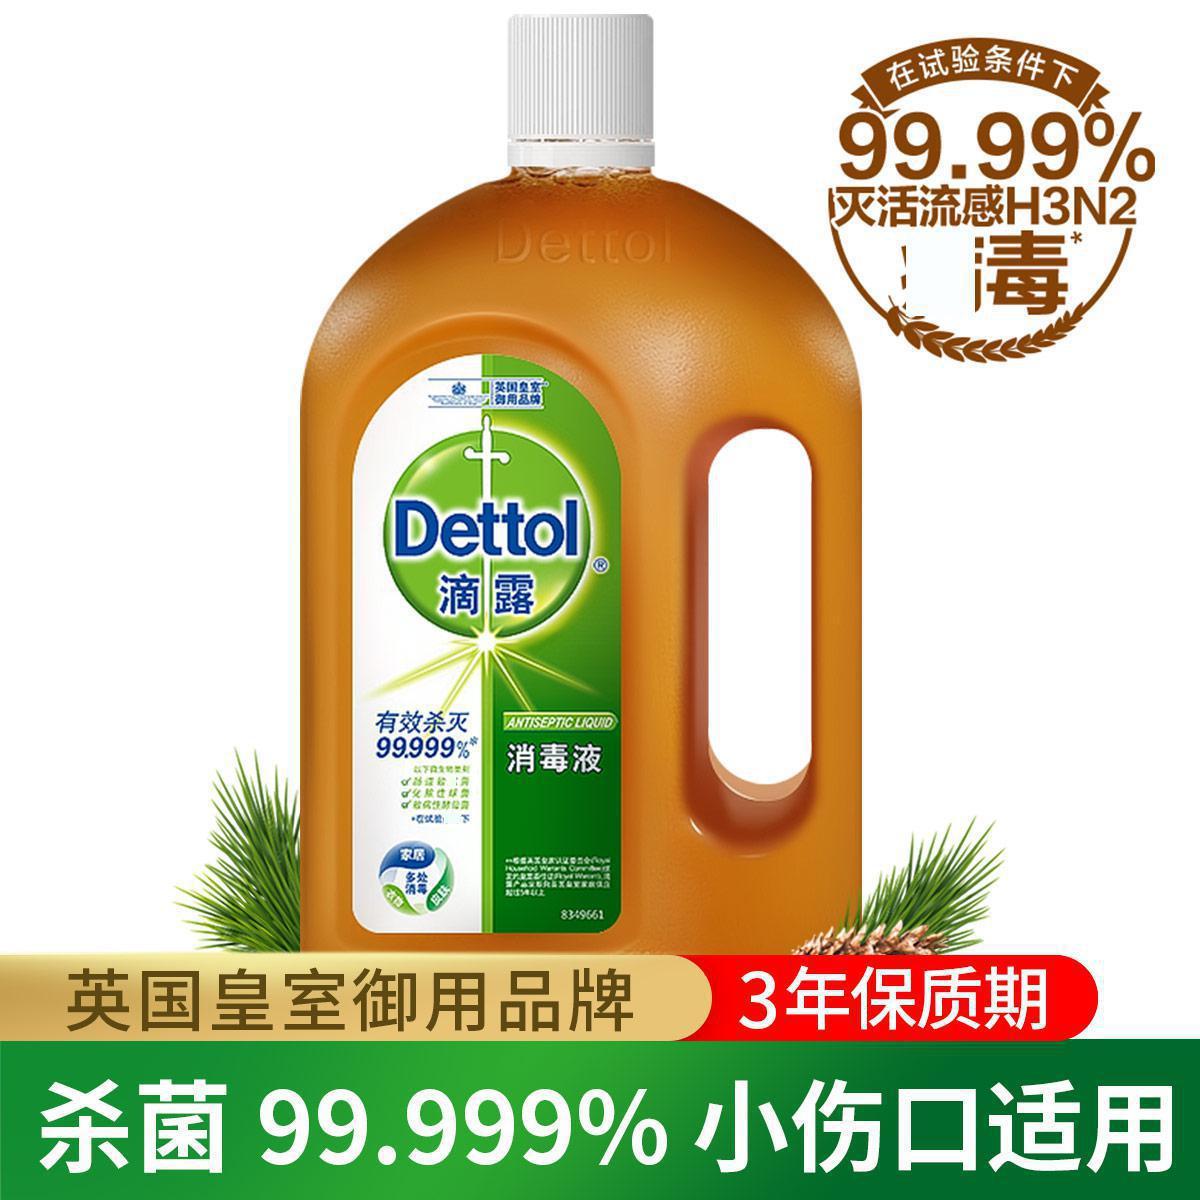 Dettol 【杀菌99.999%】滴露消毒液1.8L杀菌除螨 小伤口适用 家用消毒液